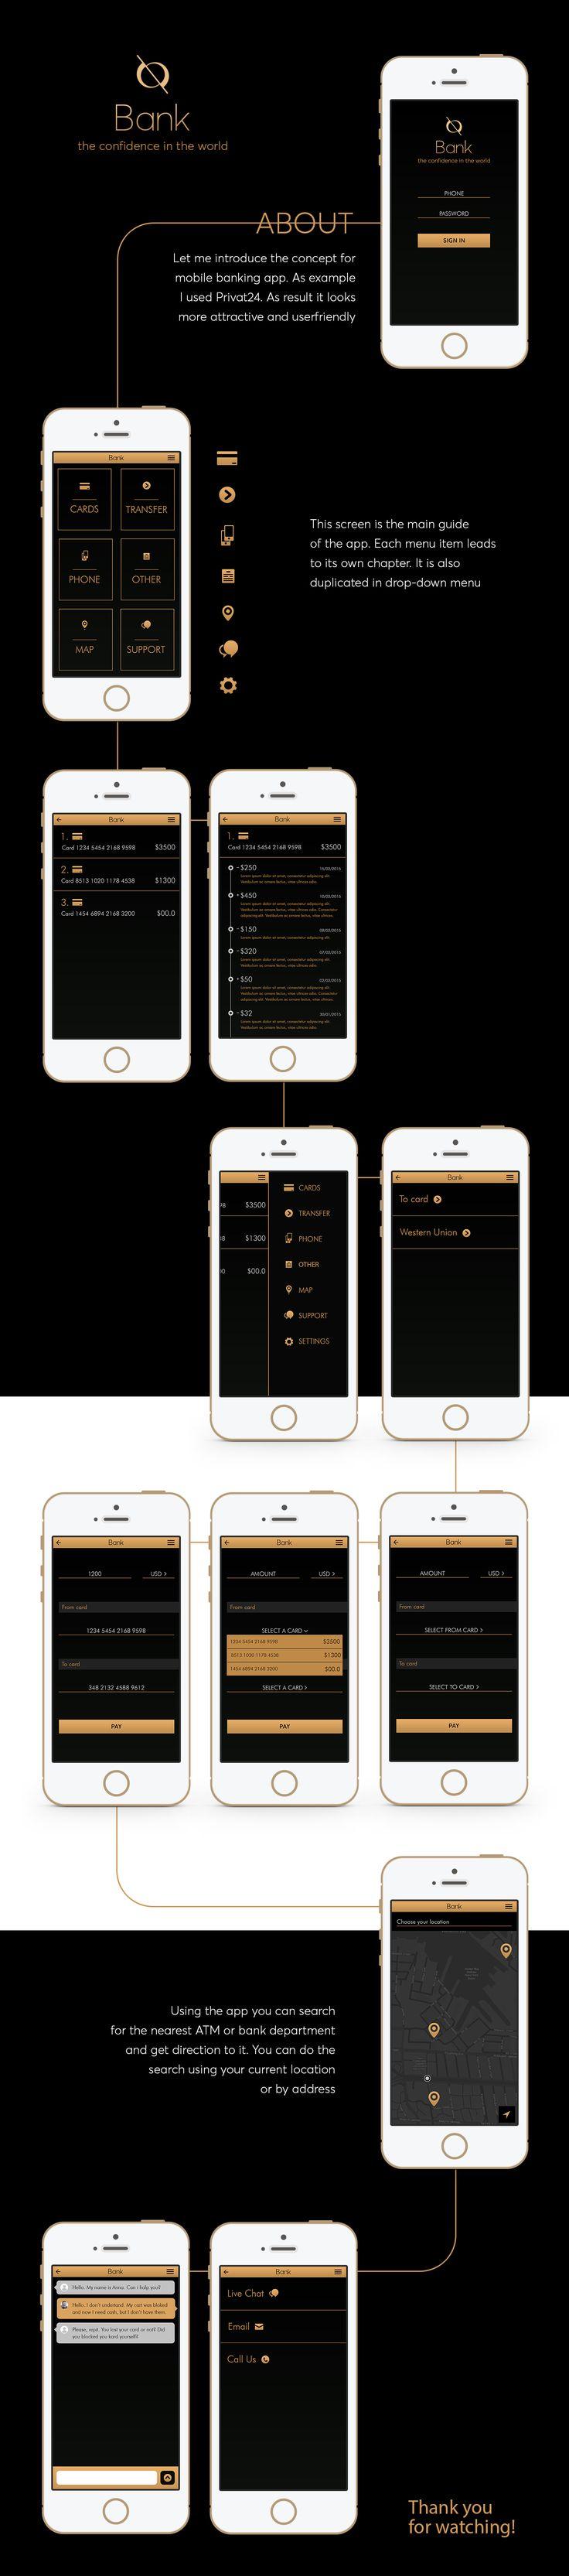 Concept Bank App on Behance